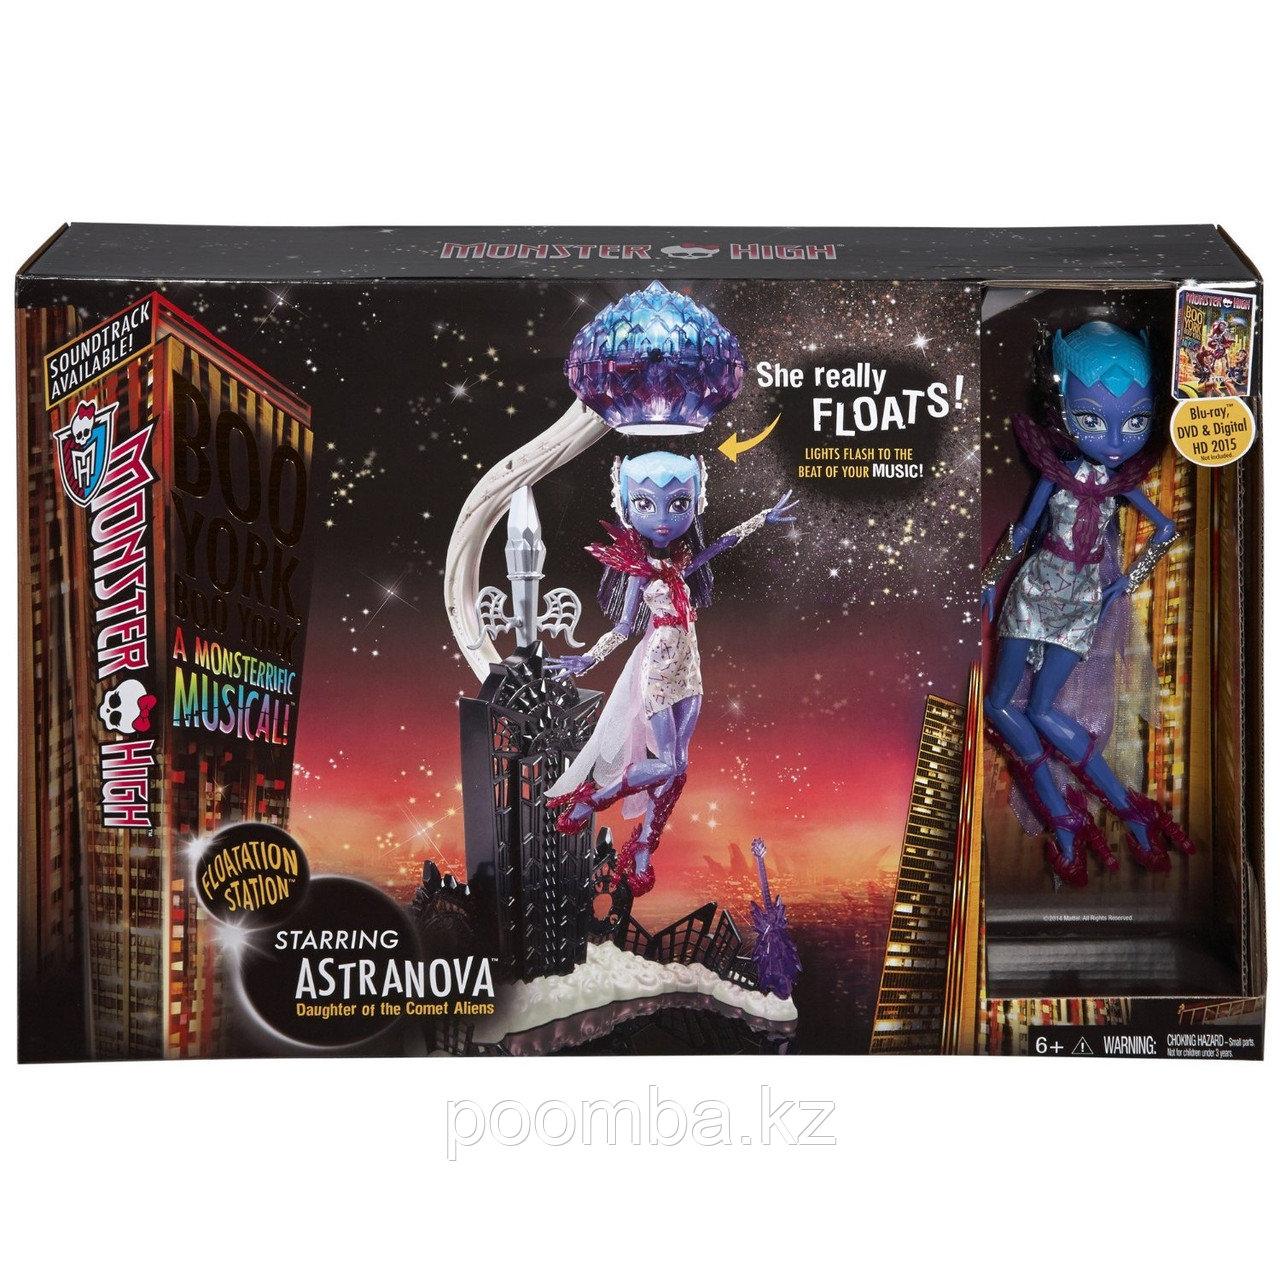 "Monster high""Boo York,Boo York""-Floatation Station and Astronova - фото 2"